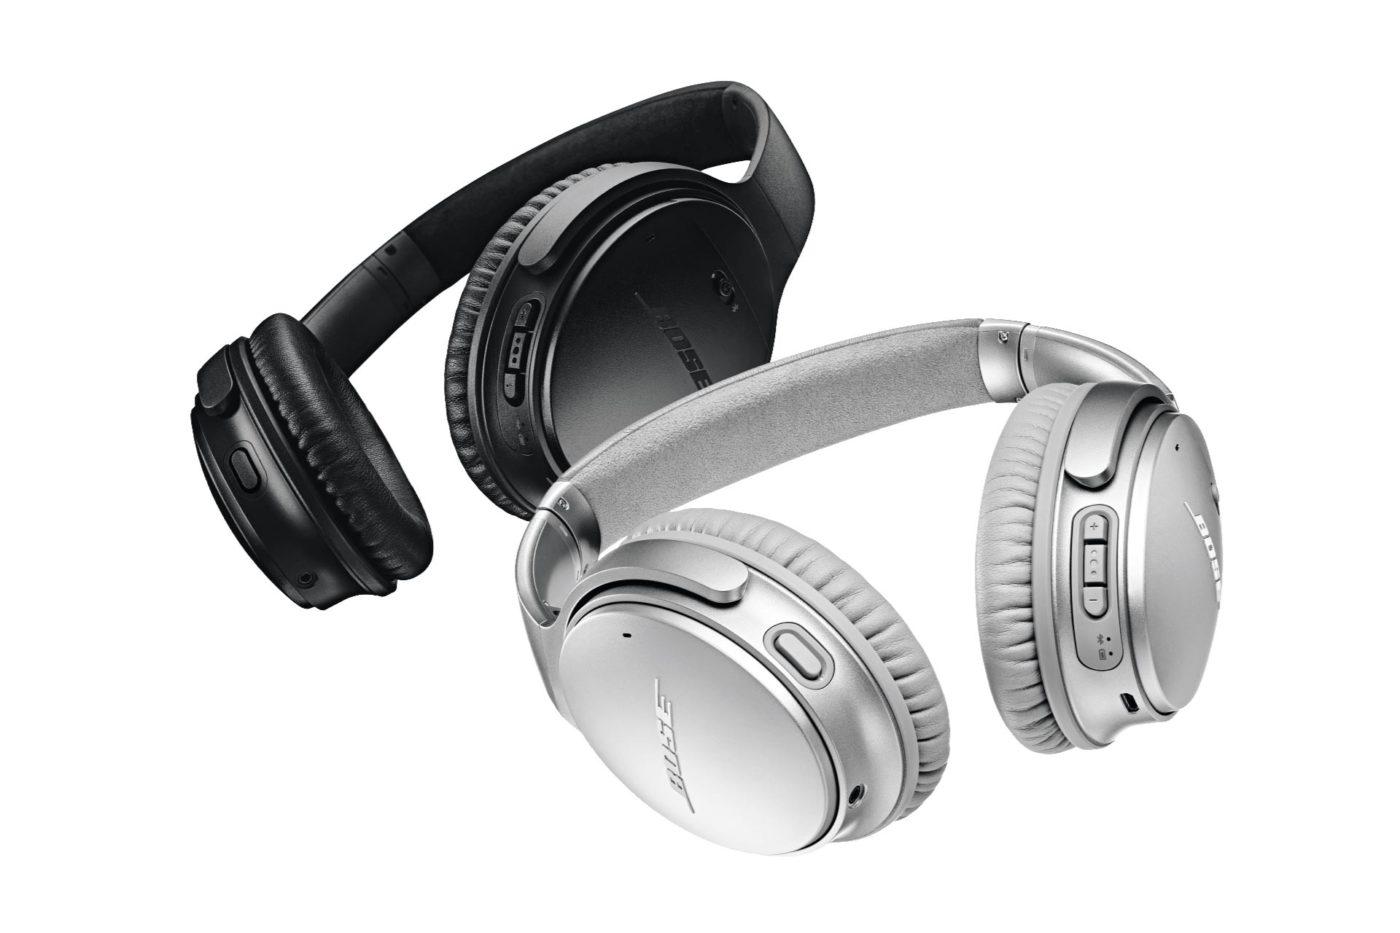 Audífonos inalámbricos Bose QuietComfort 35 II